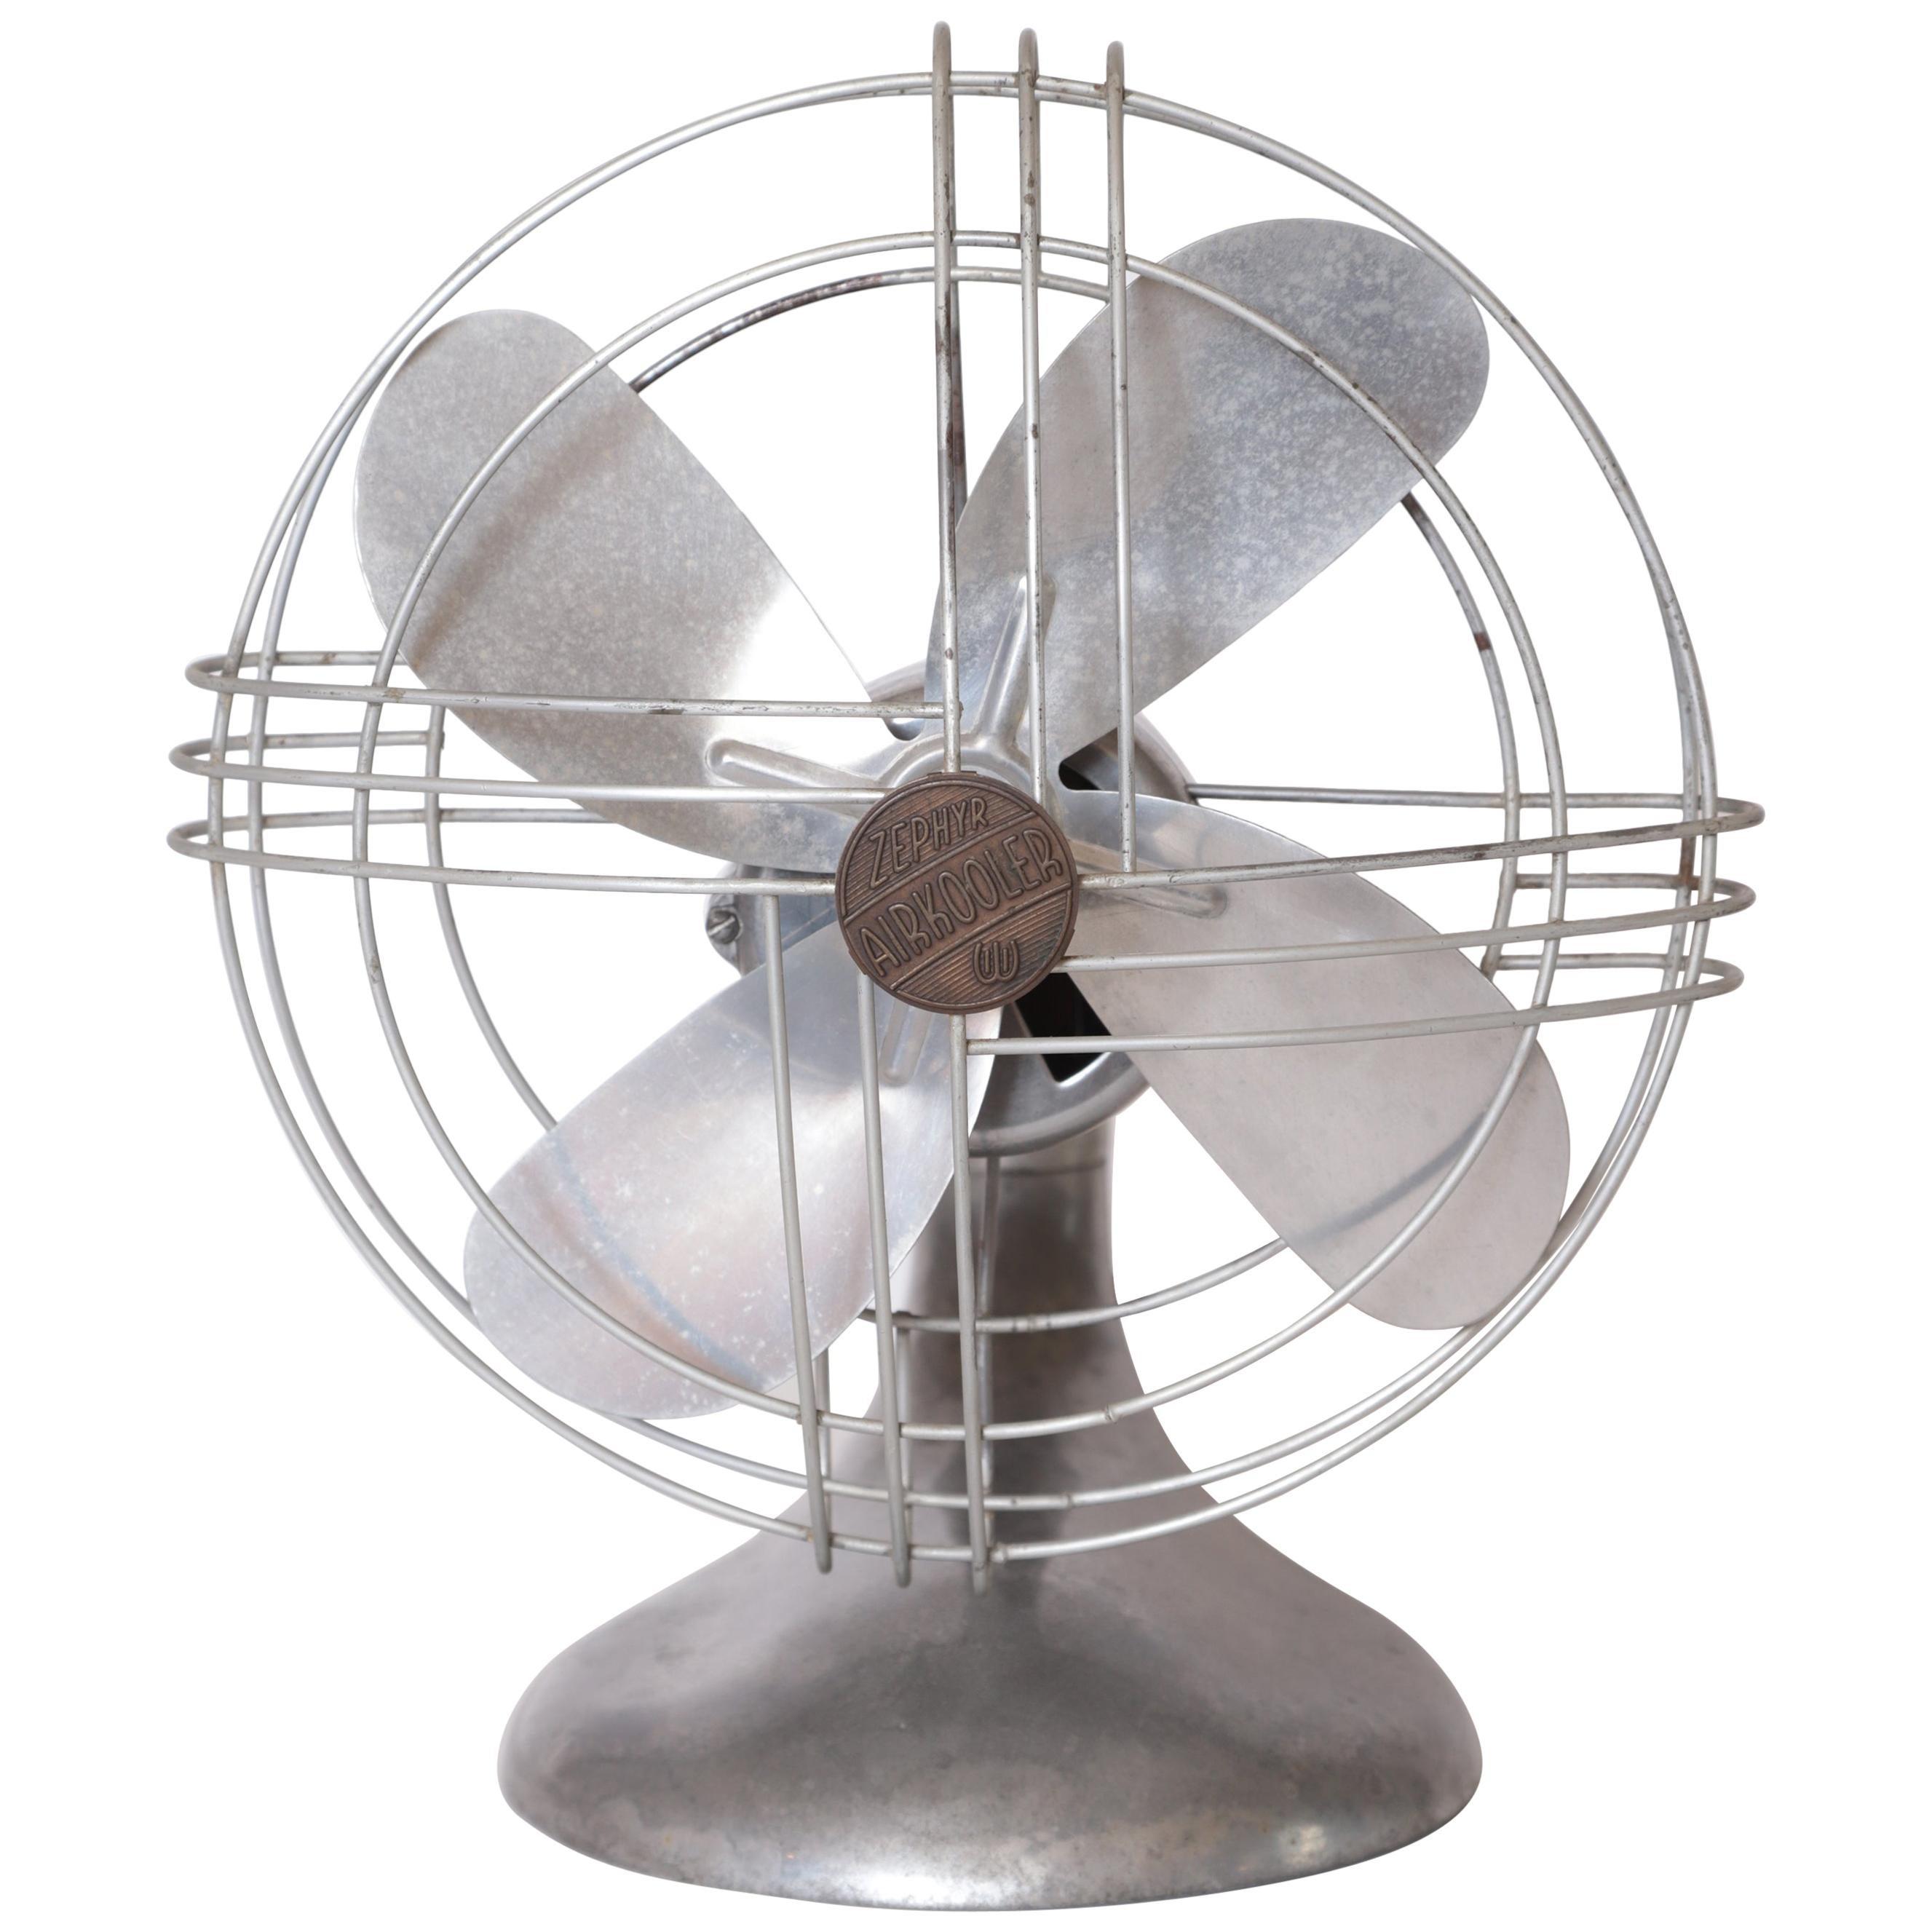 Machine Age Art Deco Streamline Aluminum Zephyr Airkooler Goose-Neck Fan